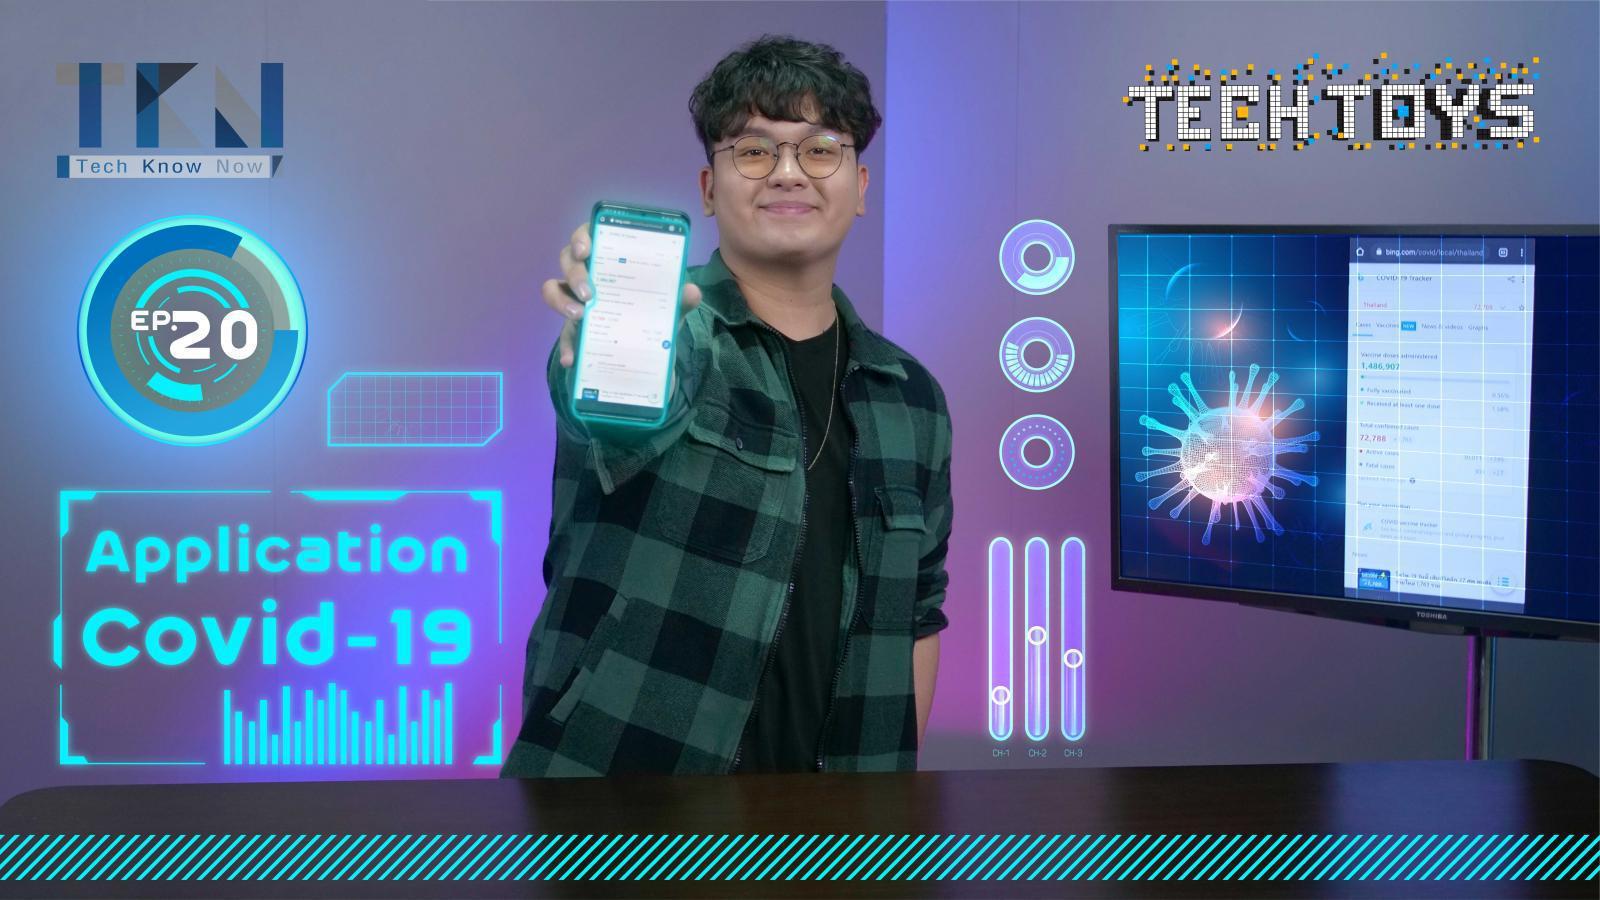 Tech Know Now EP.20 | Away Covid-19 มินิแอปพลิเคชัน | PPTV HD 36